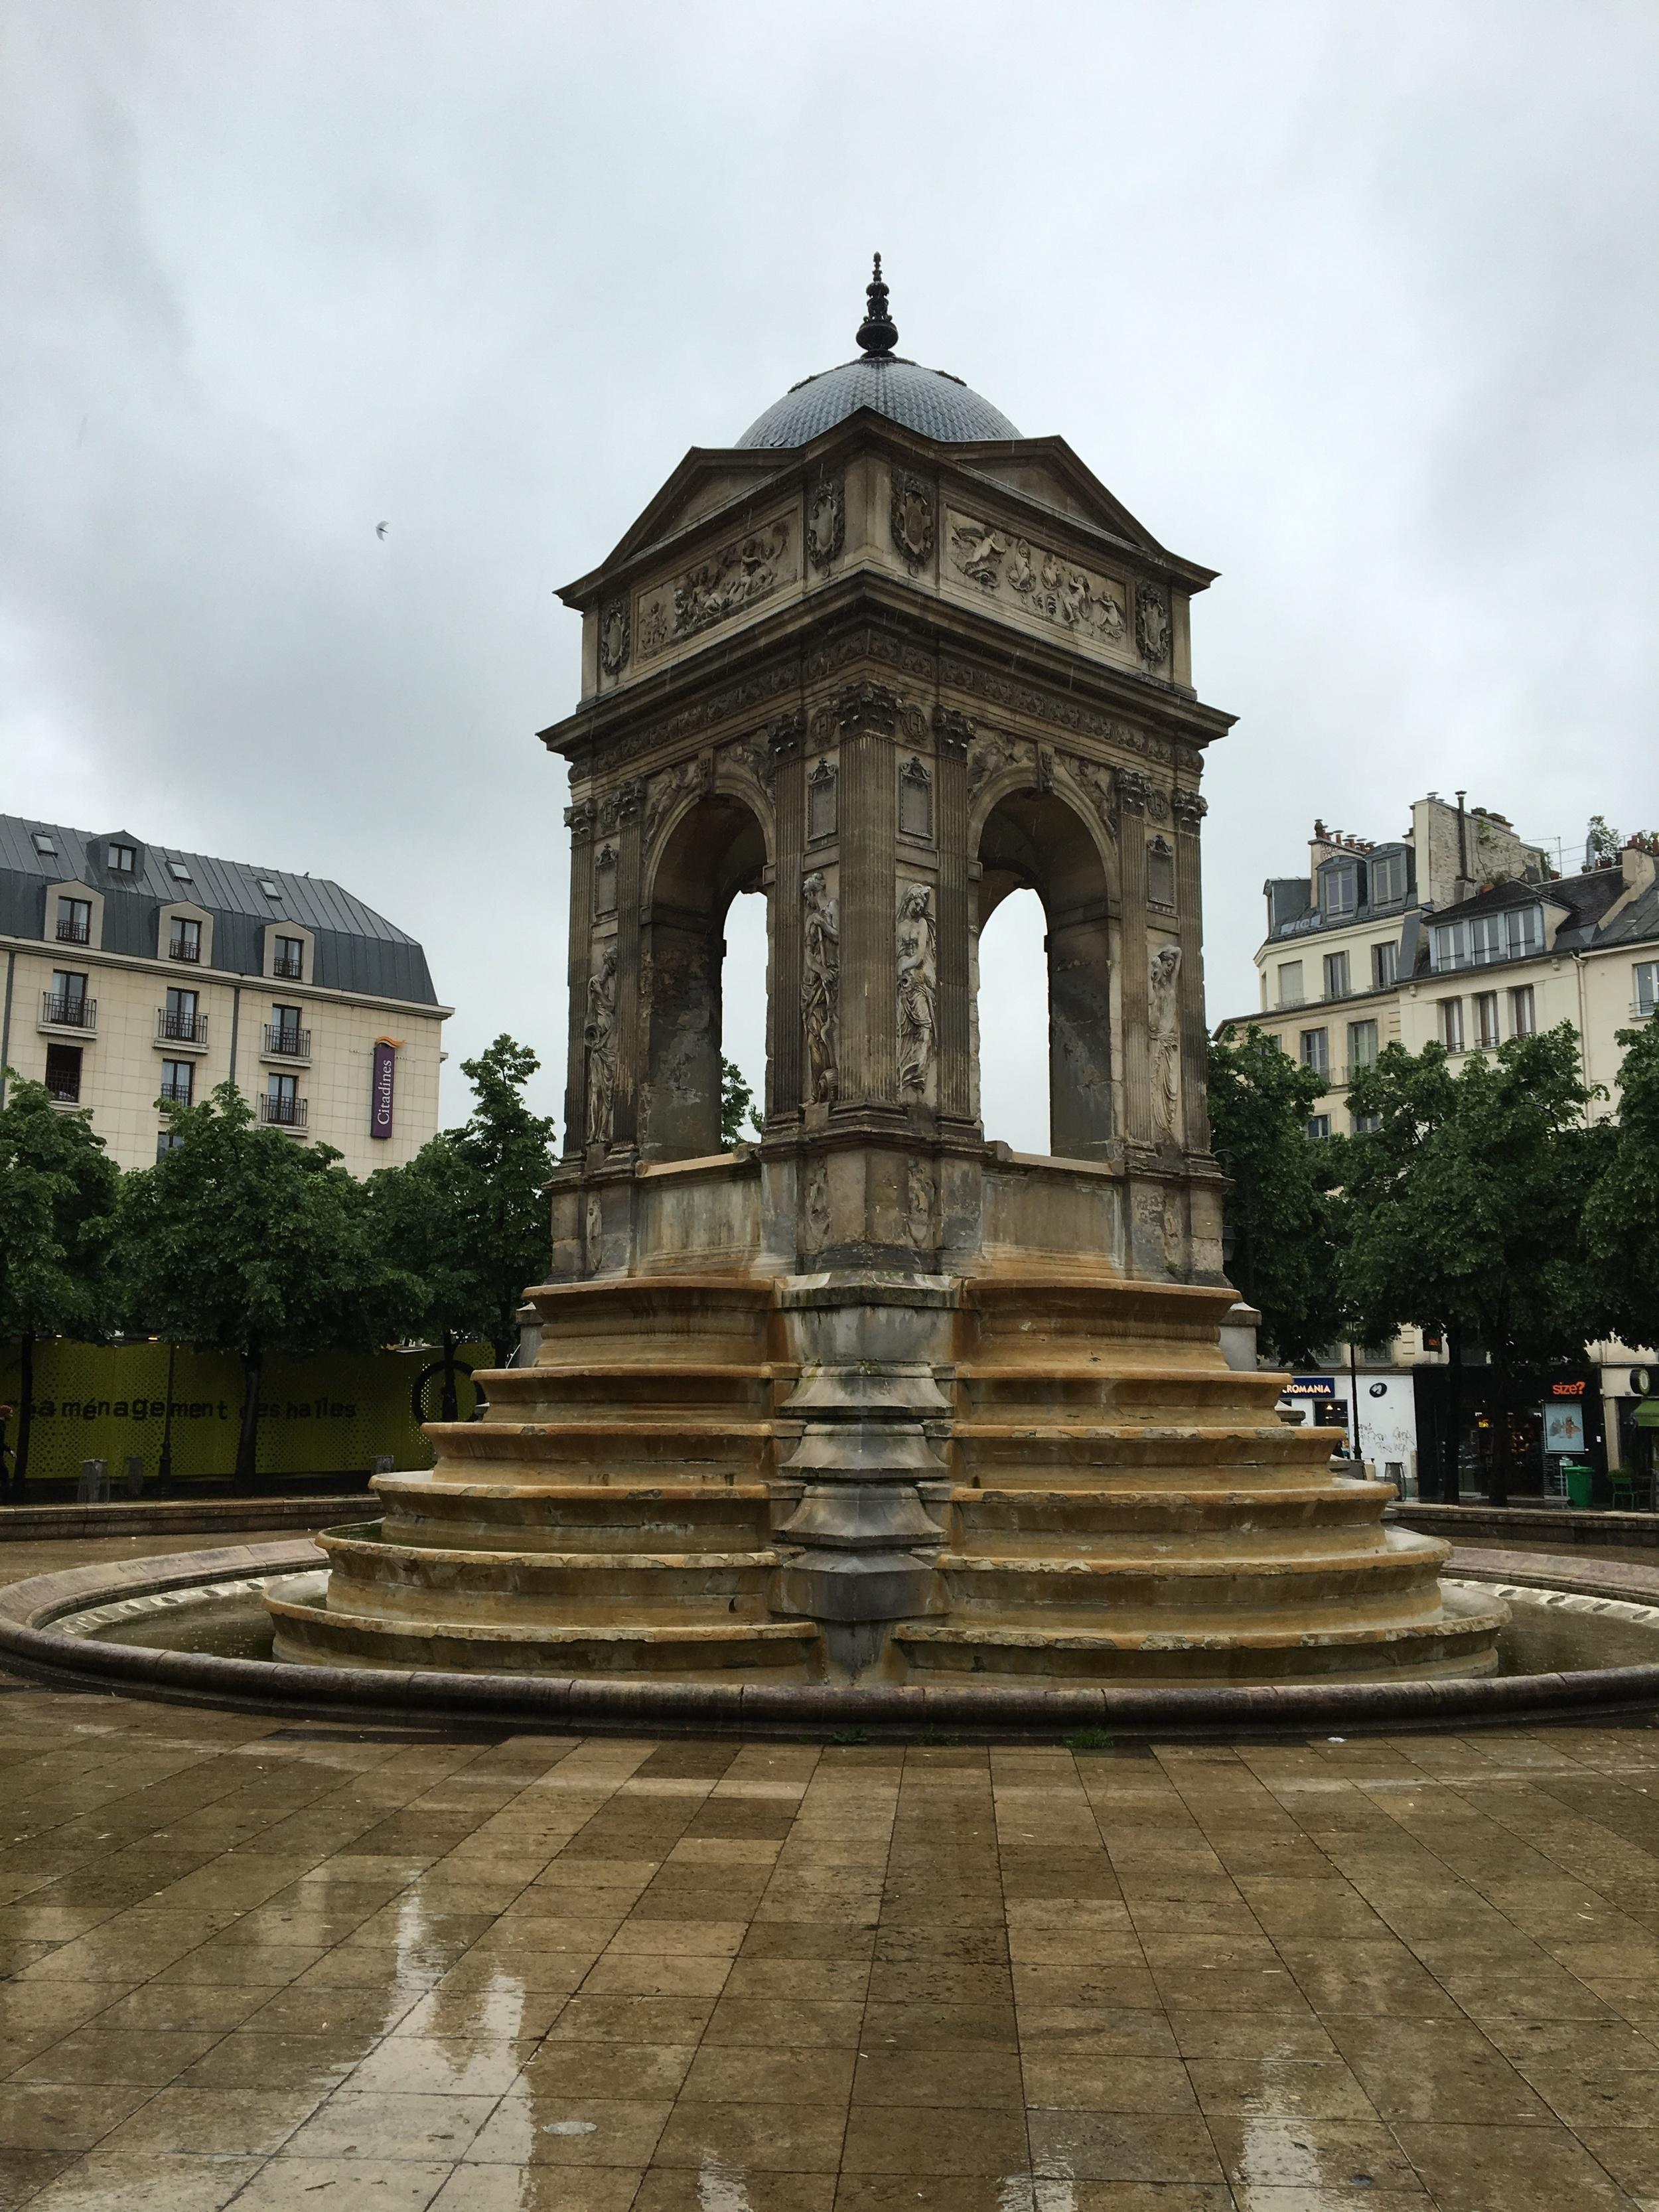 In Les Halles, the last Renaissance fountain in the city- Les Fontaine des Innocents